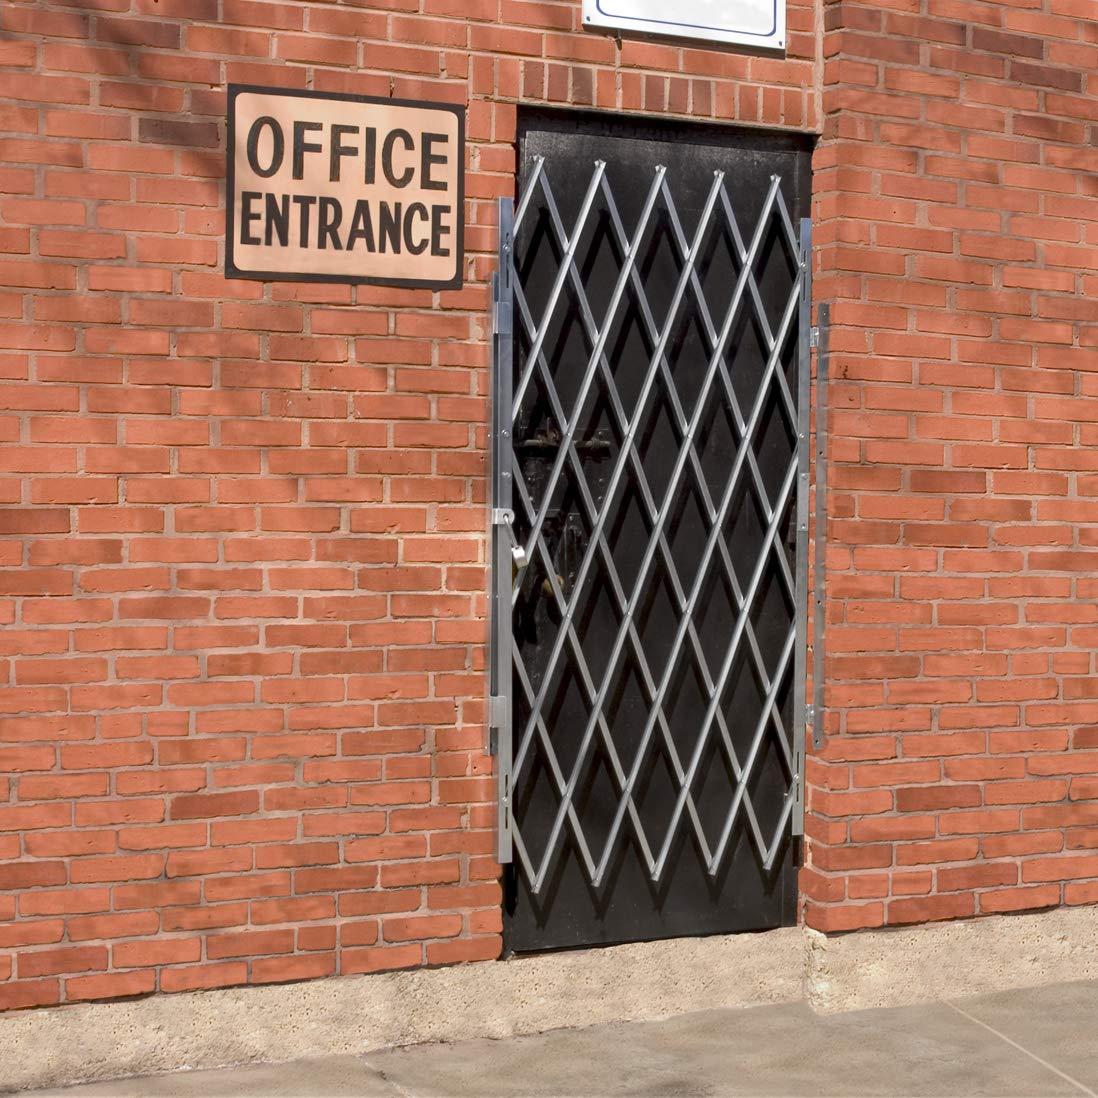 Illinois Engineered Products Folding Door Gate, 48'' W x 43'' H by Illinois Engineered Products